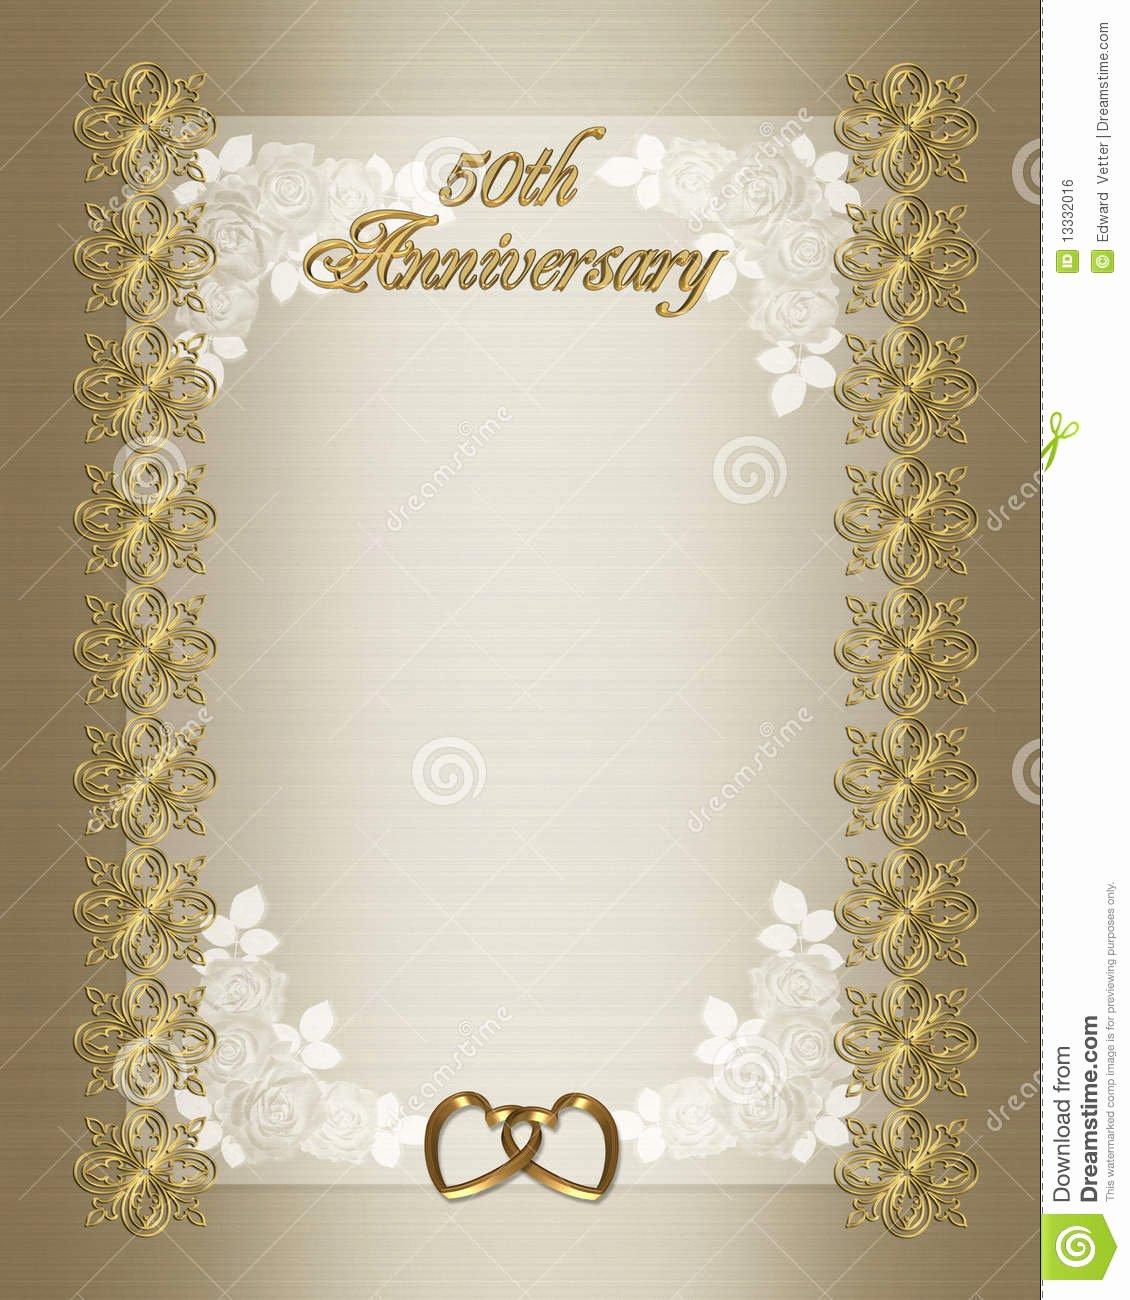 50th Wedding Anniversary Invitation Template Stock